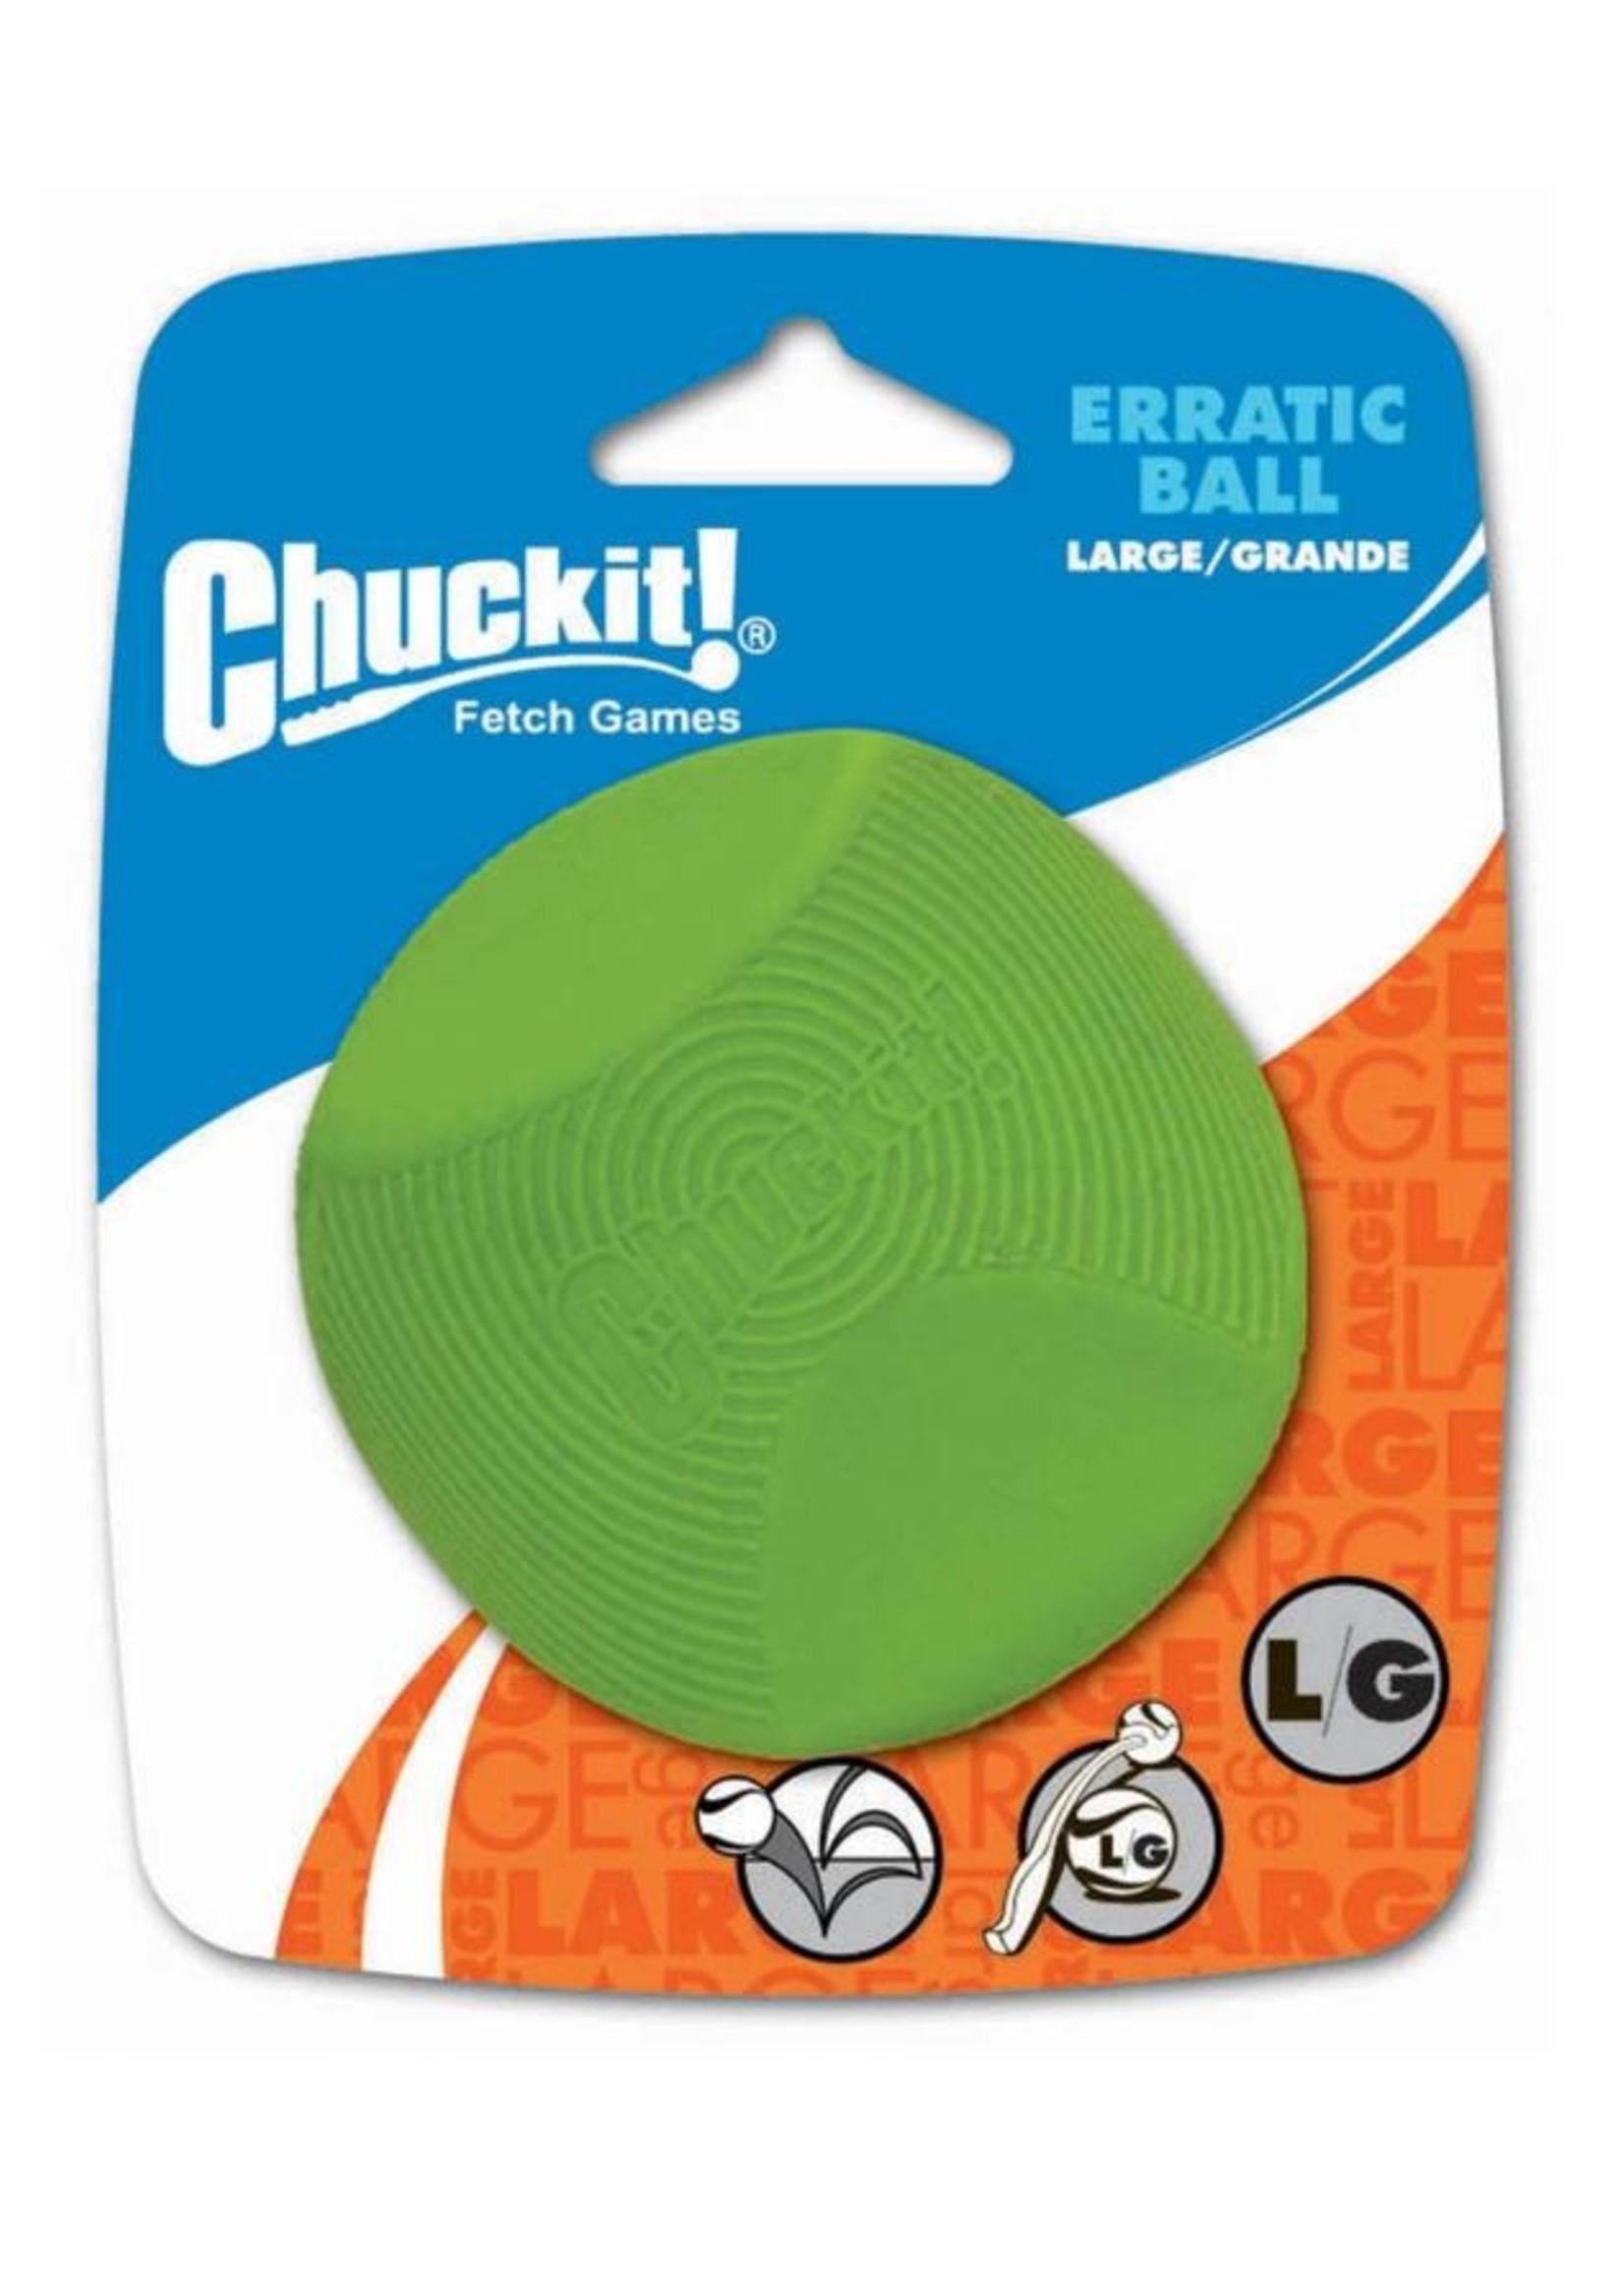 Chuckit! Chuckit! Erratic Ball Large